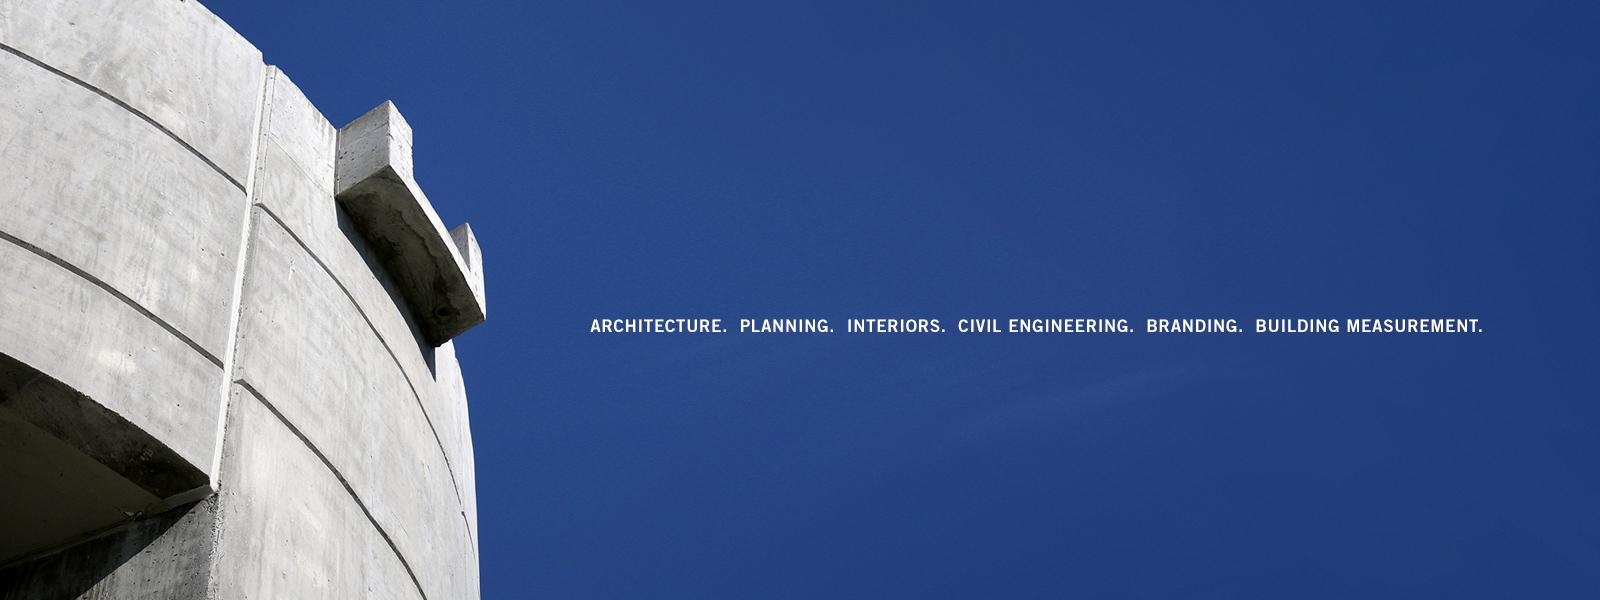 Architecture.  Planning.  Interiors.  Civil engineering.  Branding.  Building measurement